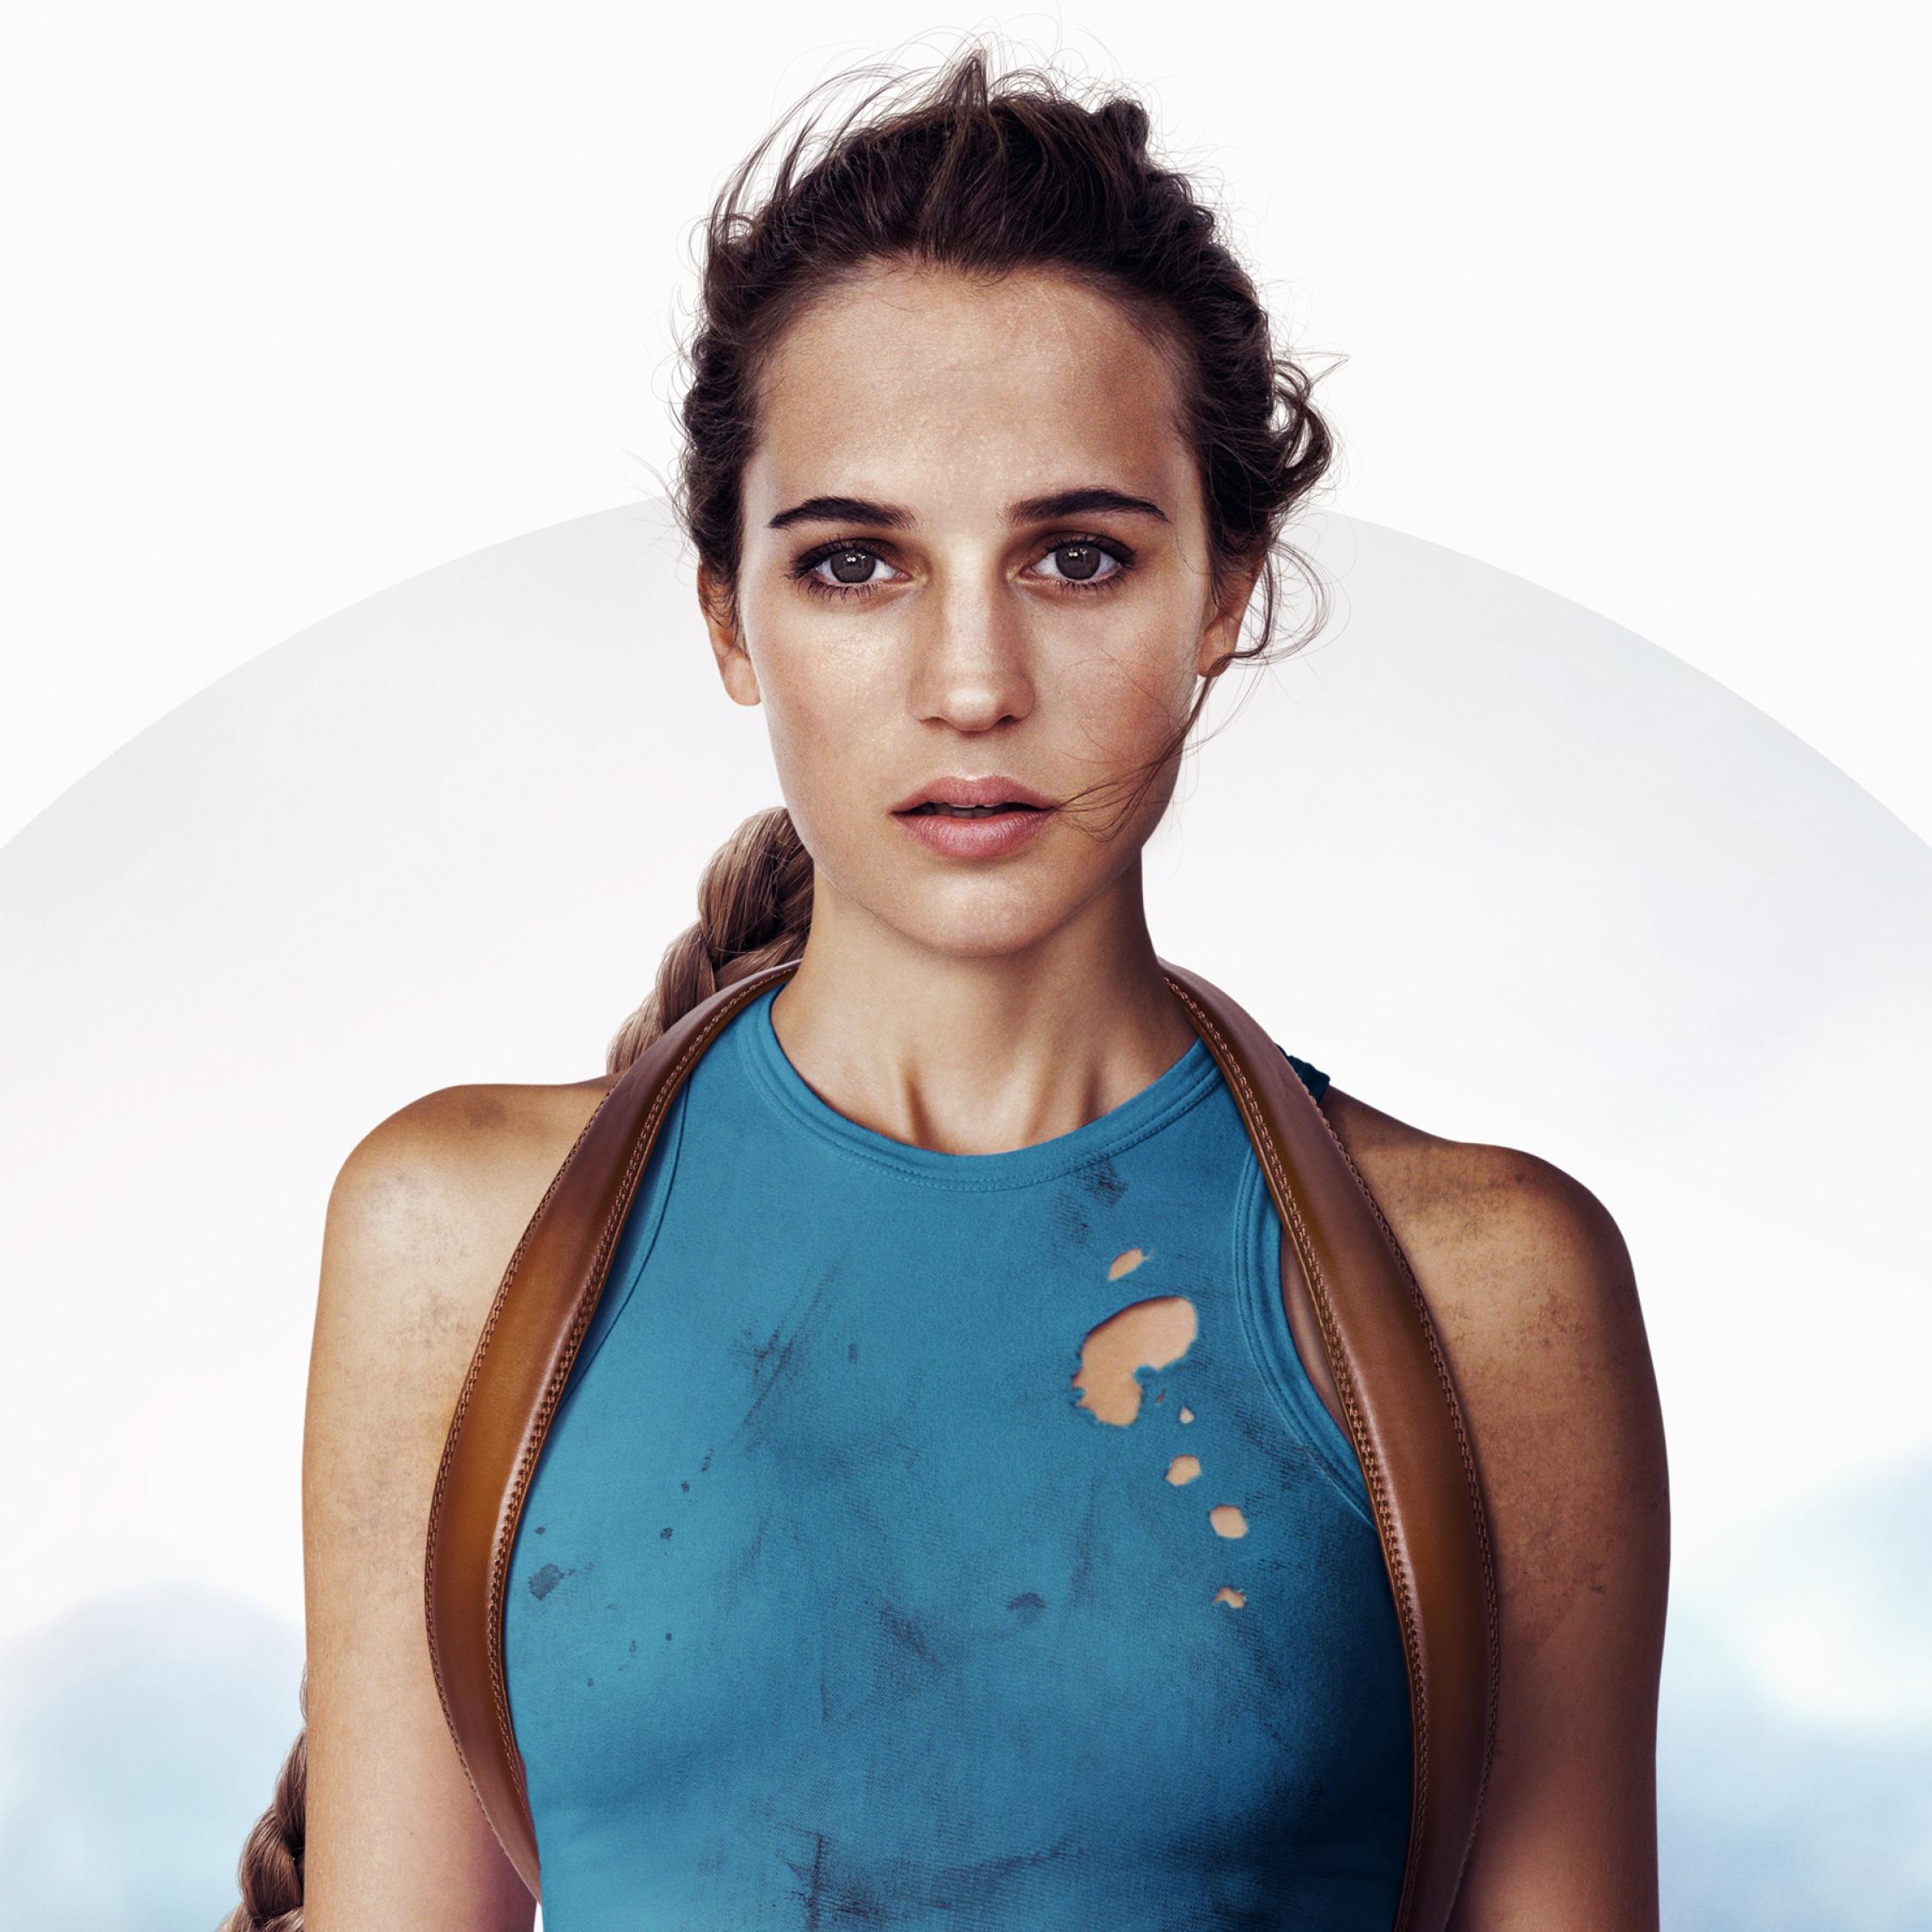 Alicia Vikander Tomb Raider: Alicia Vikander Tomb Raider, Full HD 2K Wallpaper